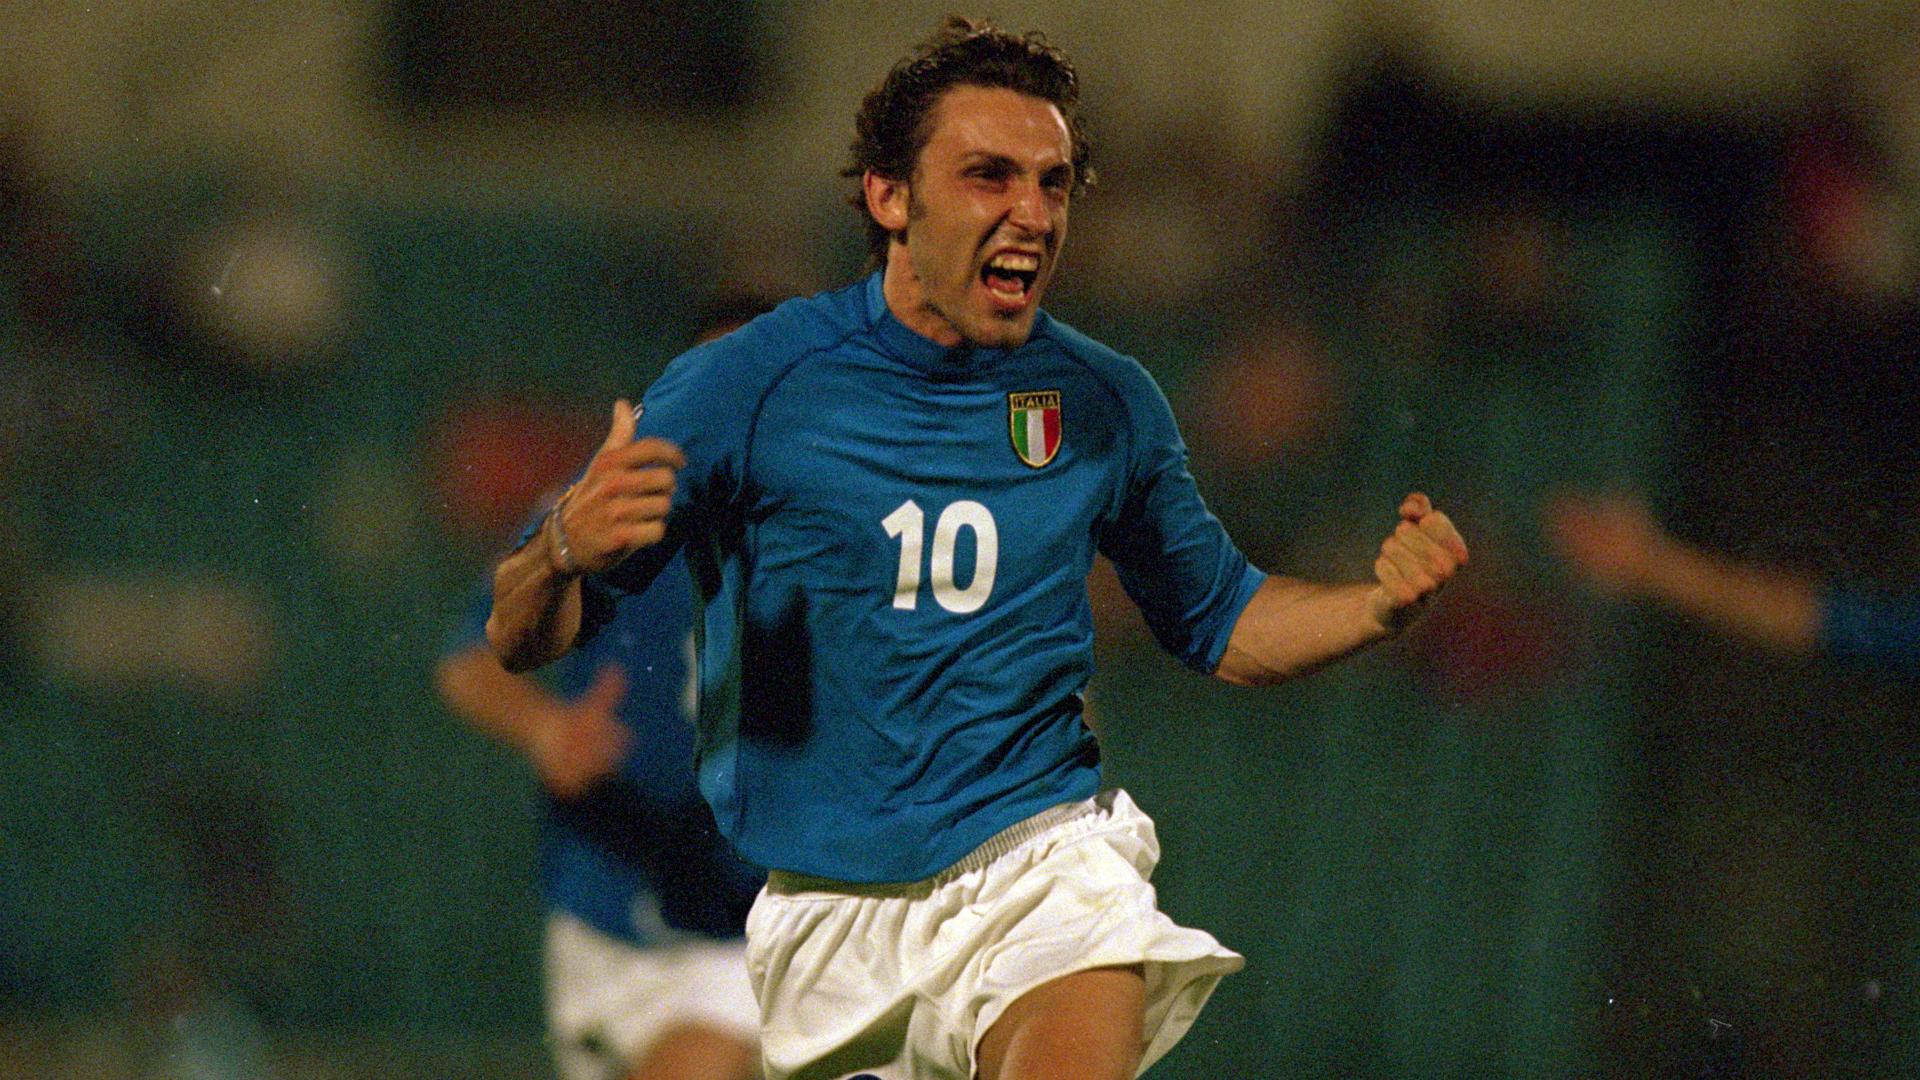 Andrea Pirlo European Under-21 Championships 2000 Italy